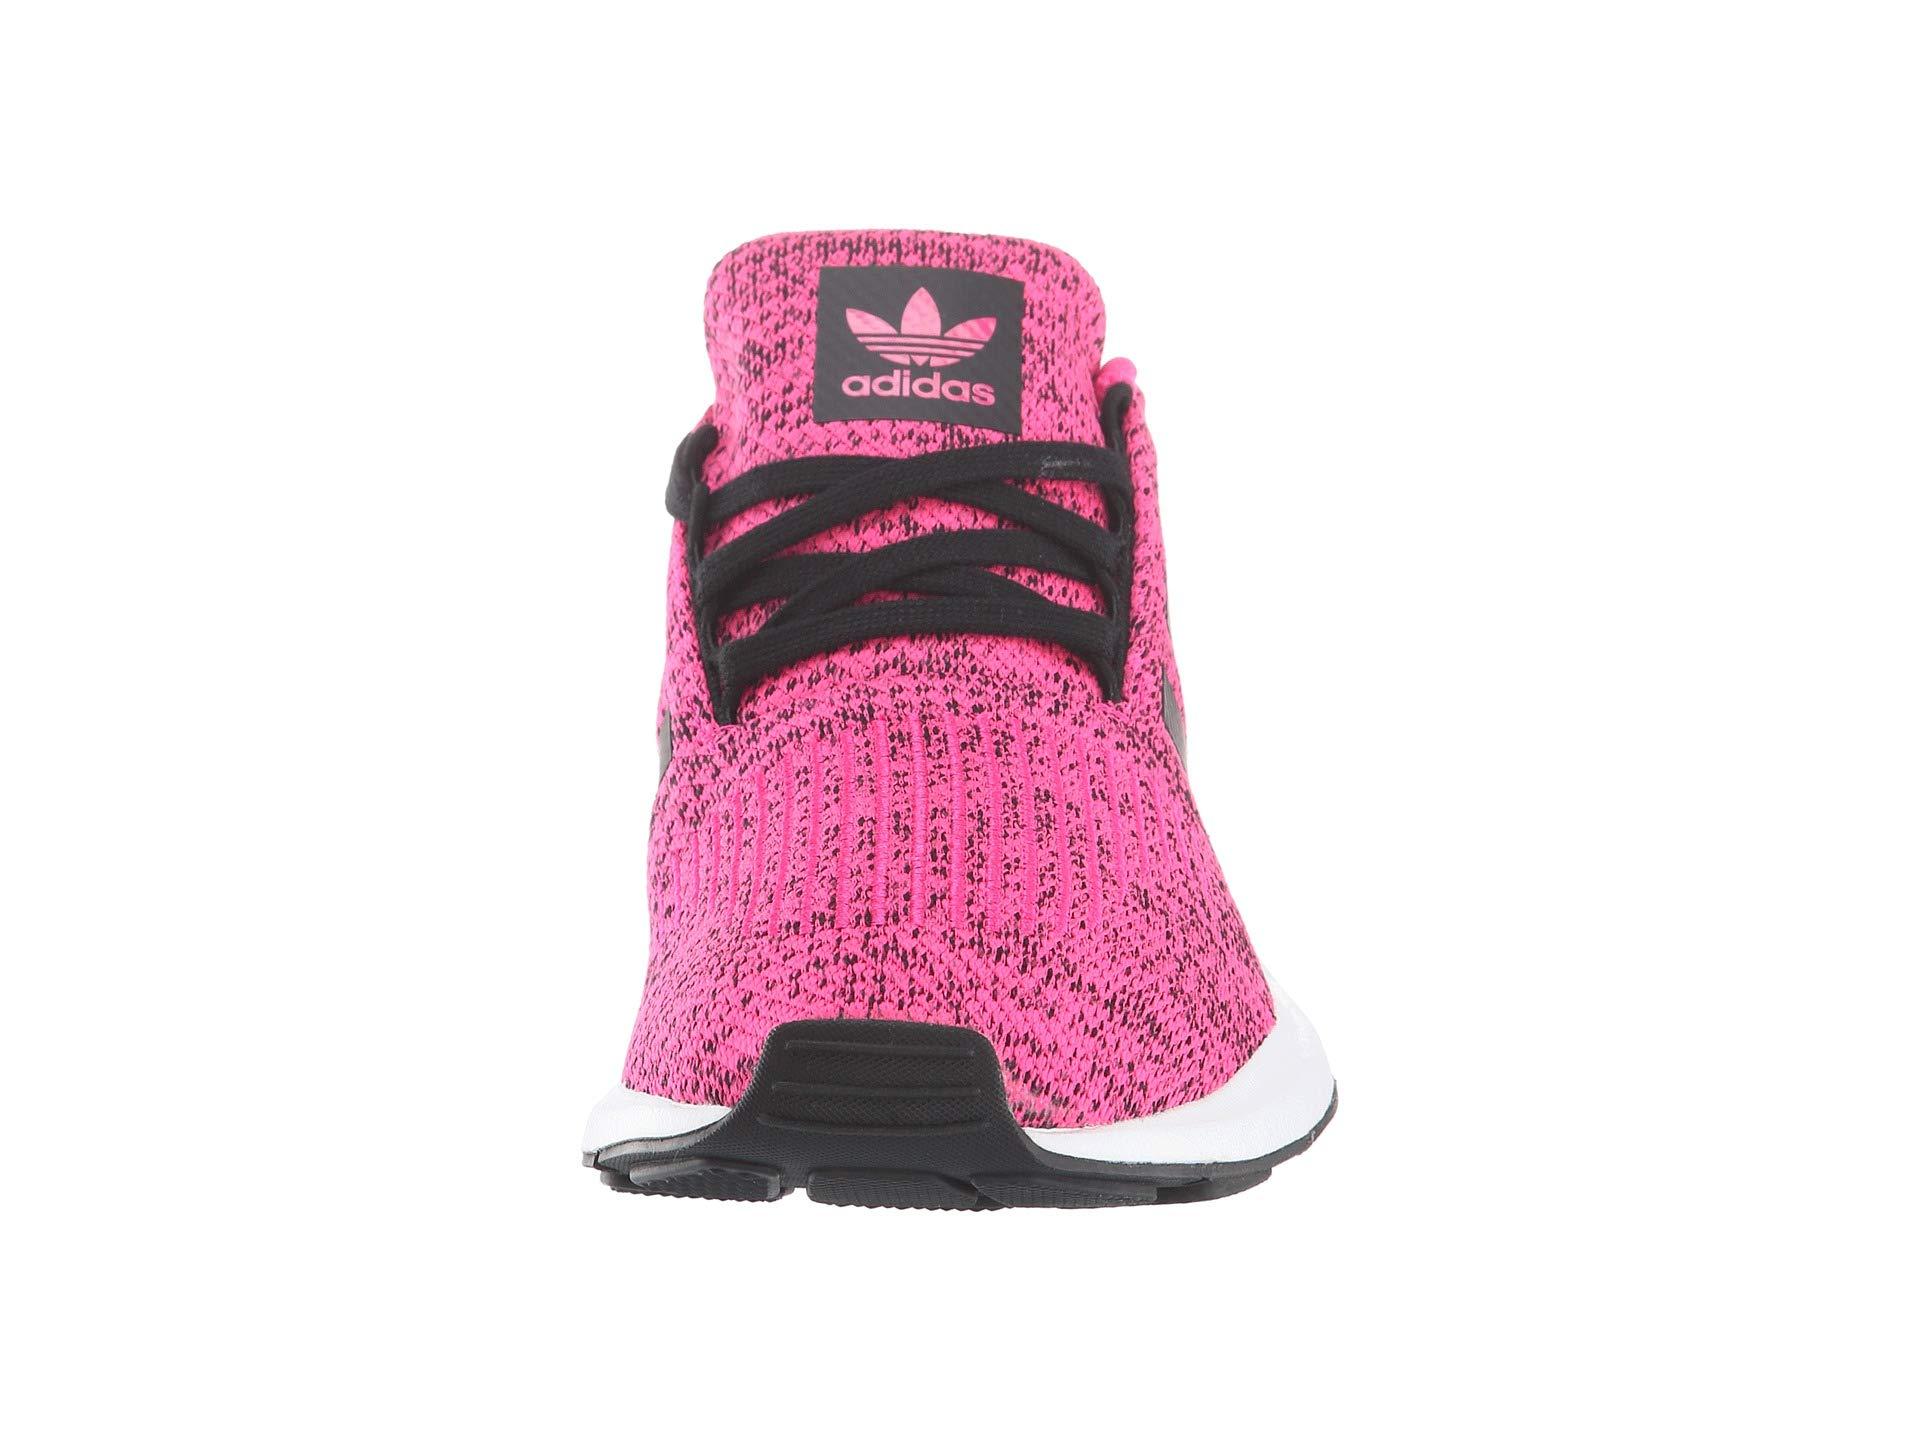 adidas Originals Kids Girl's Swift Run J (Big Kid) Shock Pink/Black 4.5 M US Big Kid by adidas Originals (Image #5)